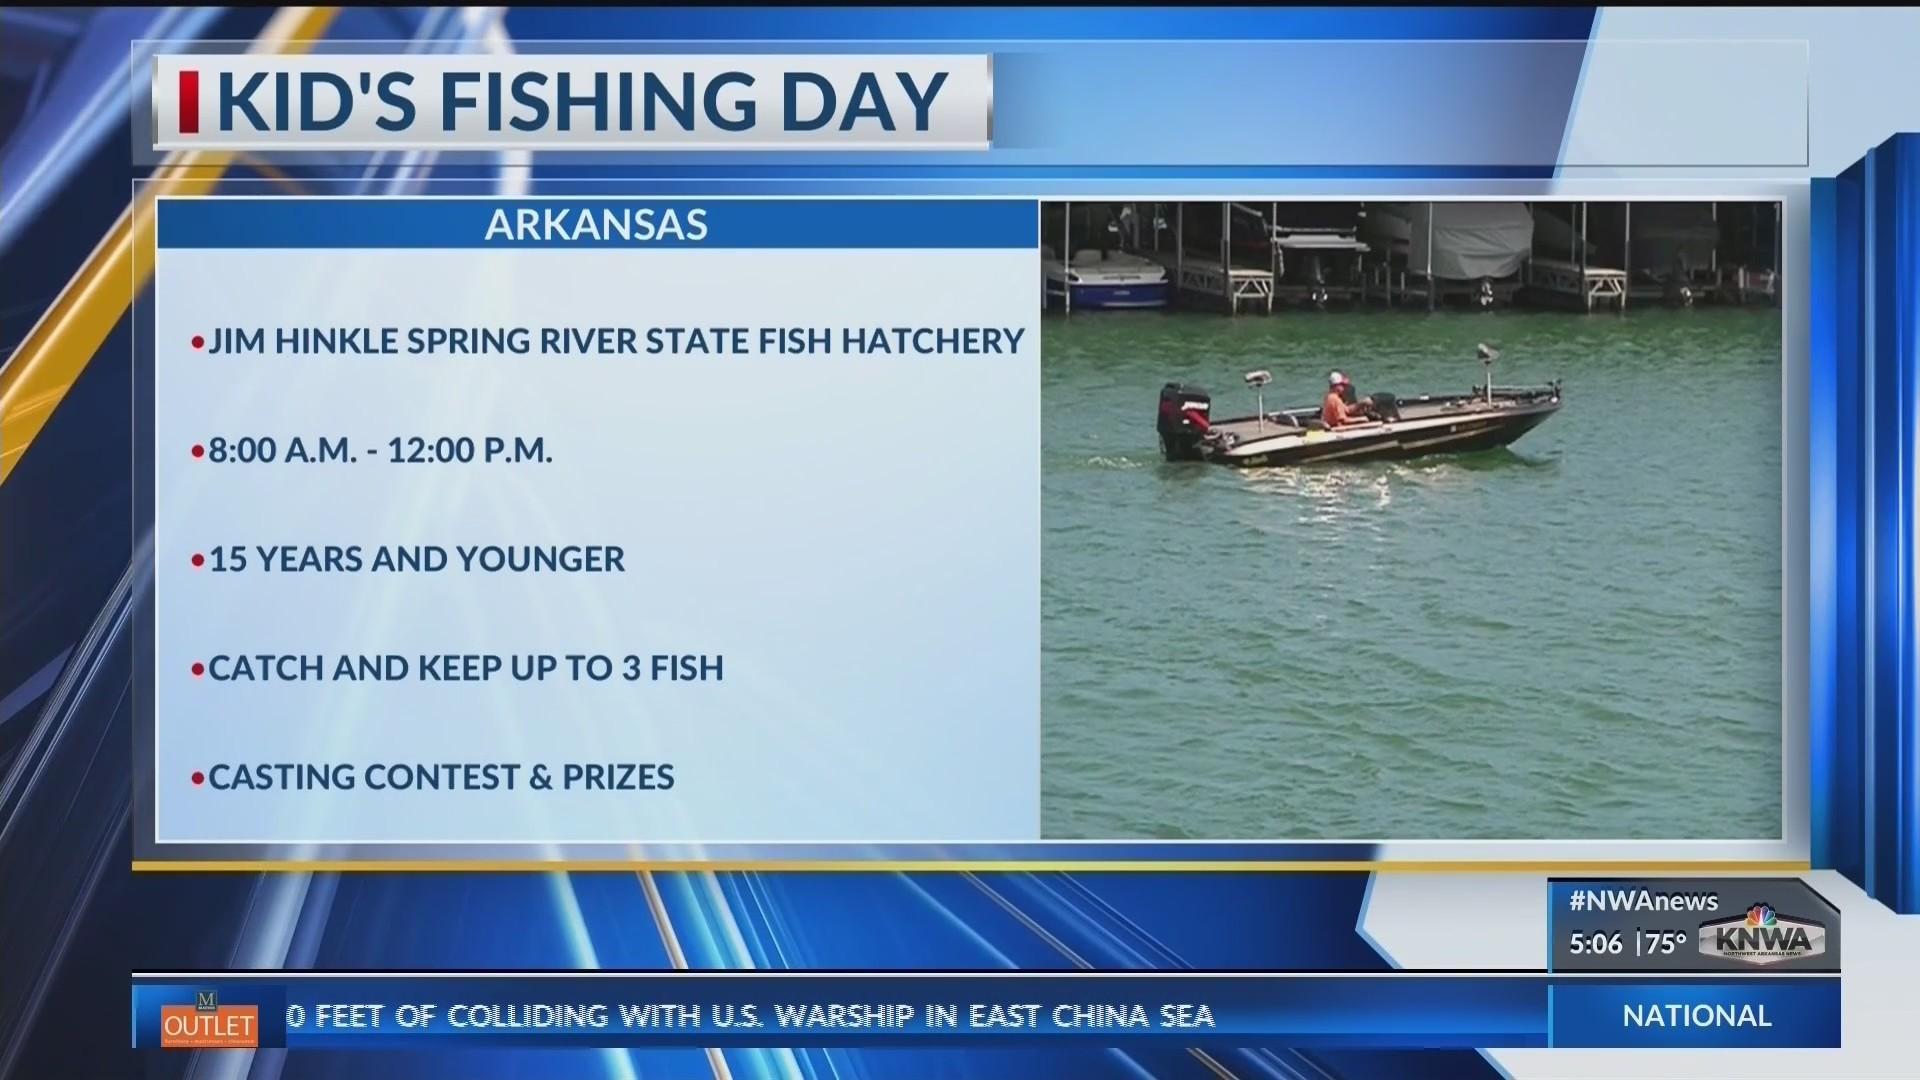 Kids Fishing Day (KNWA)